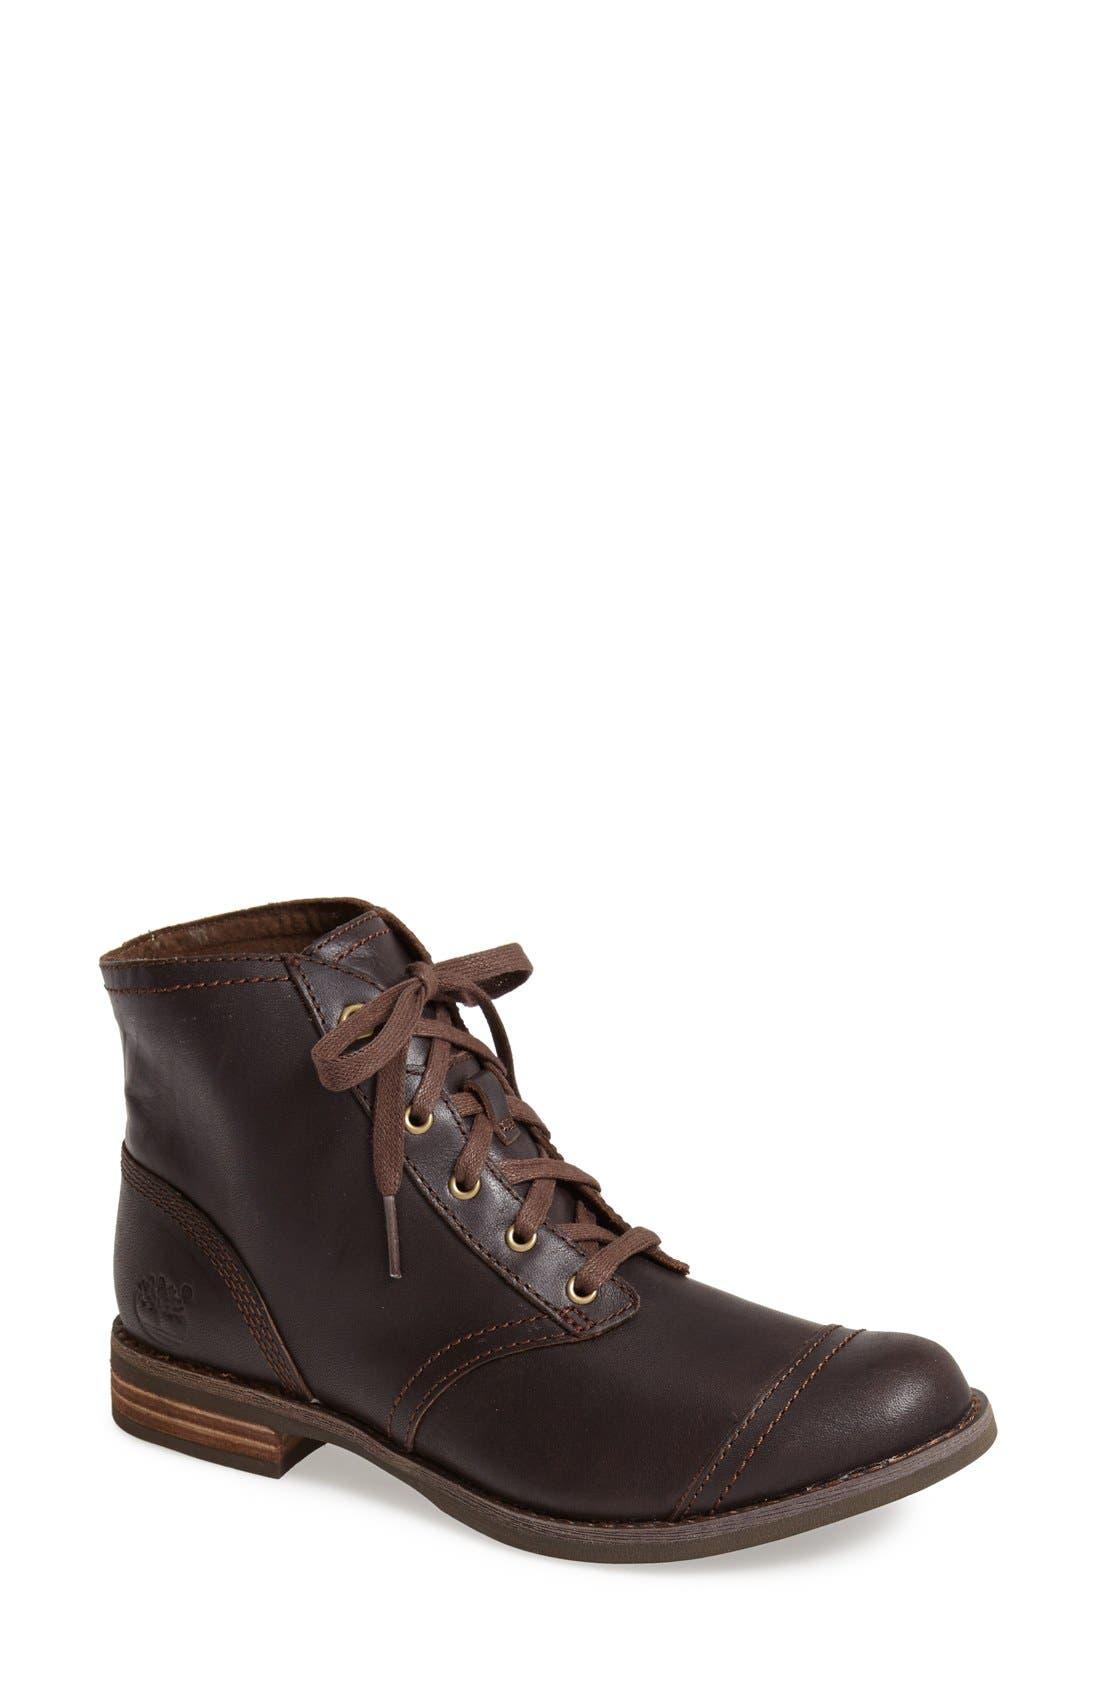 Main Image - Timberland 'Savin Hill' Leather Chukka Bootie (Women)